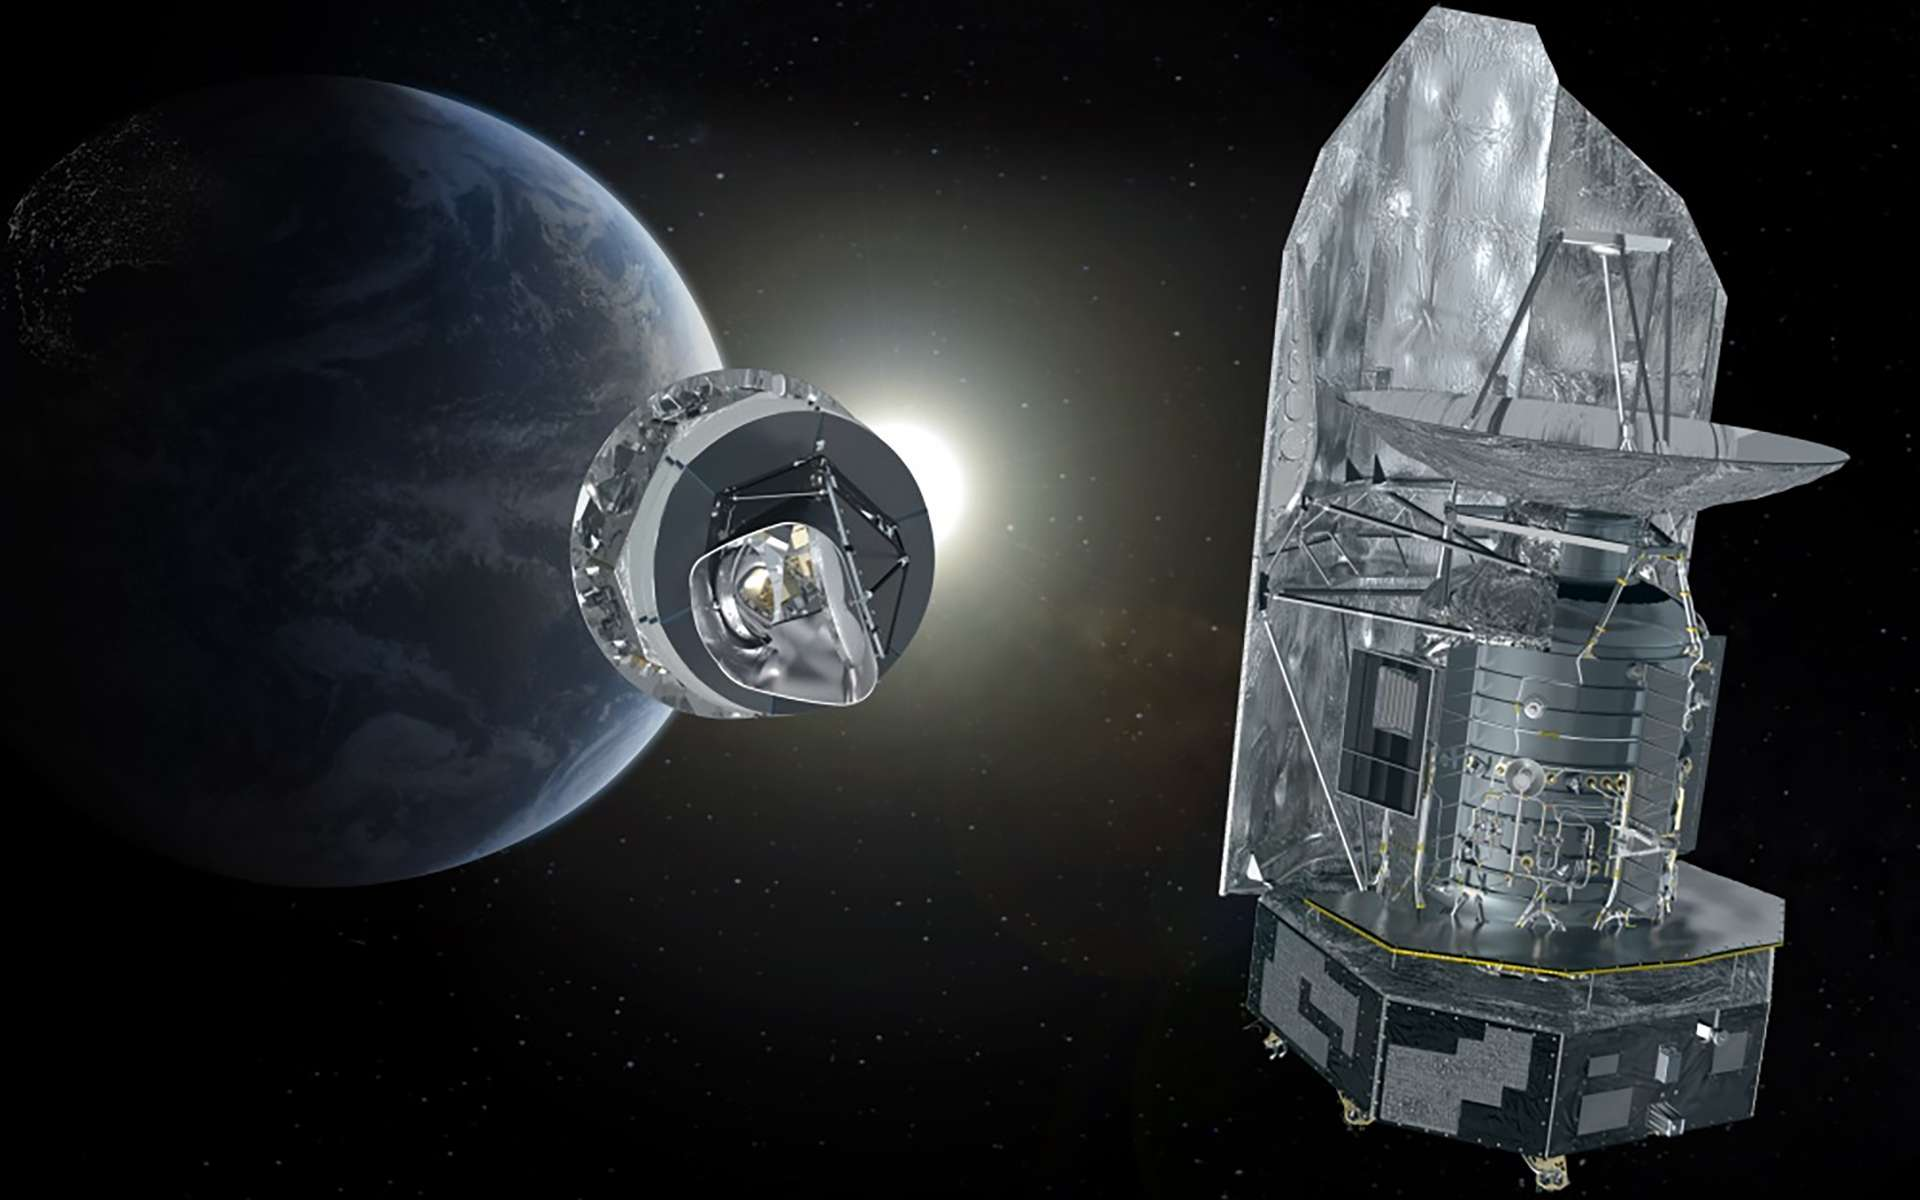 Vue d'artiste des satellites Planck et Herschel. © ESA, Thales Alenia Space